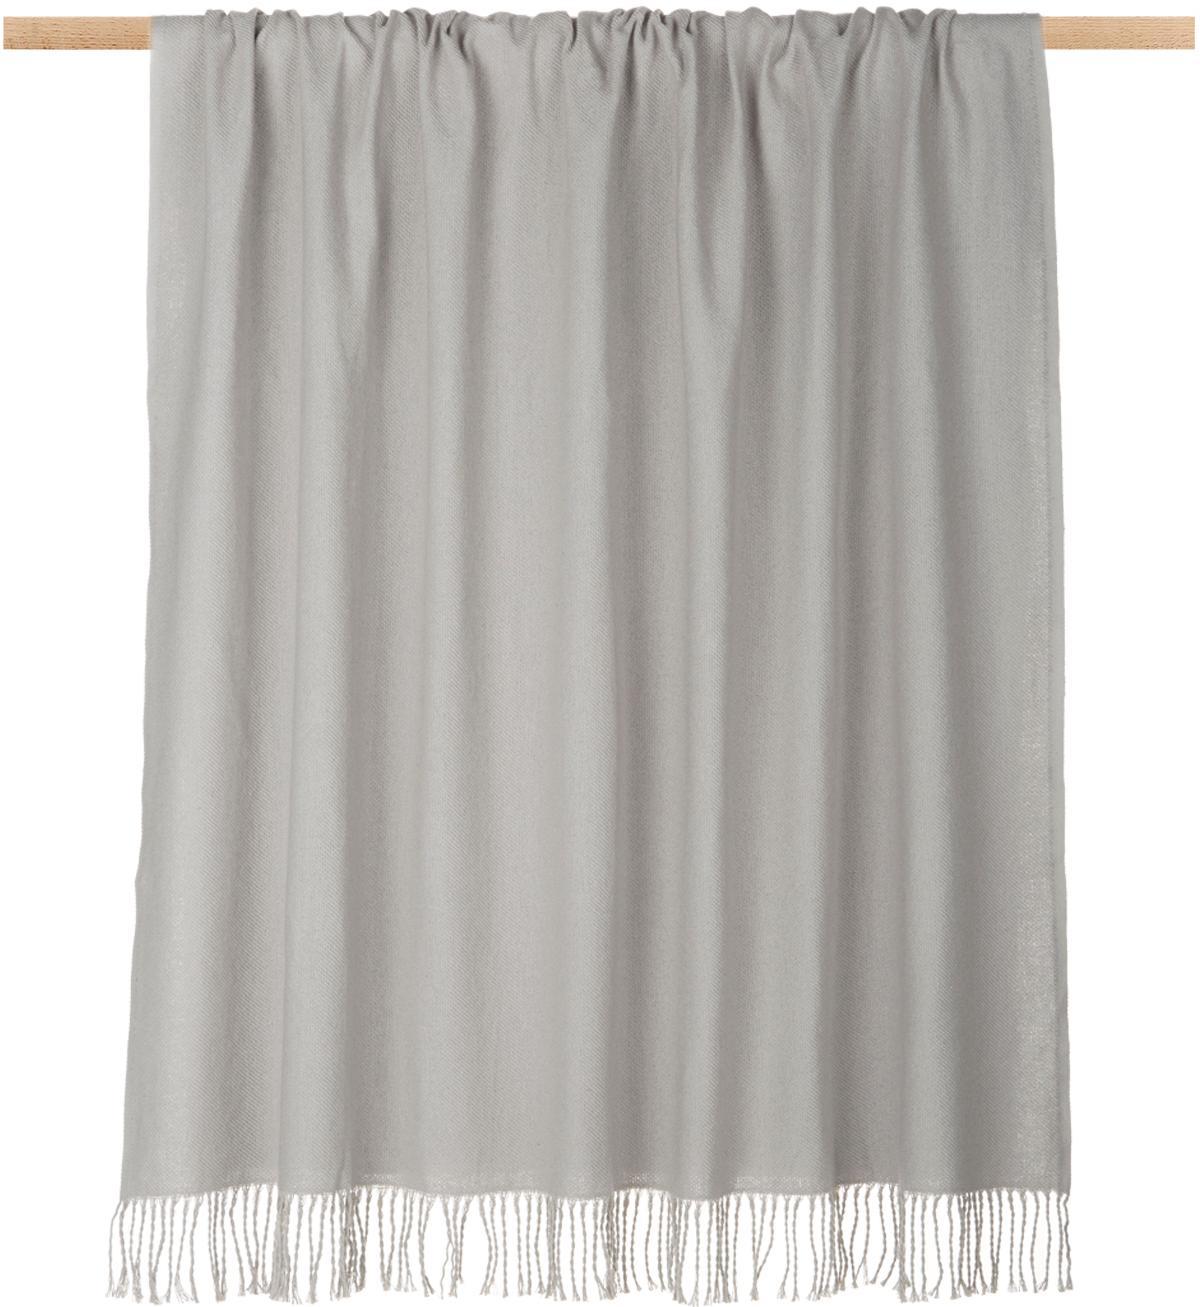 Plaid grigio chiaro con frange Madison, 100% cotone, Grigio chiaro, Larg. 130 x Lung. 170 cm